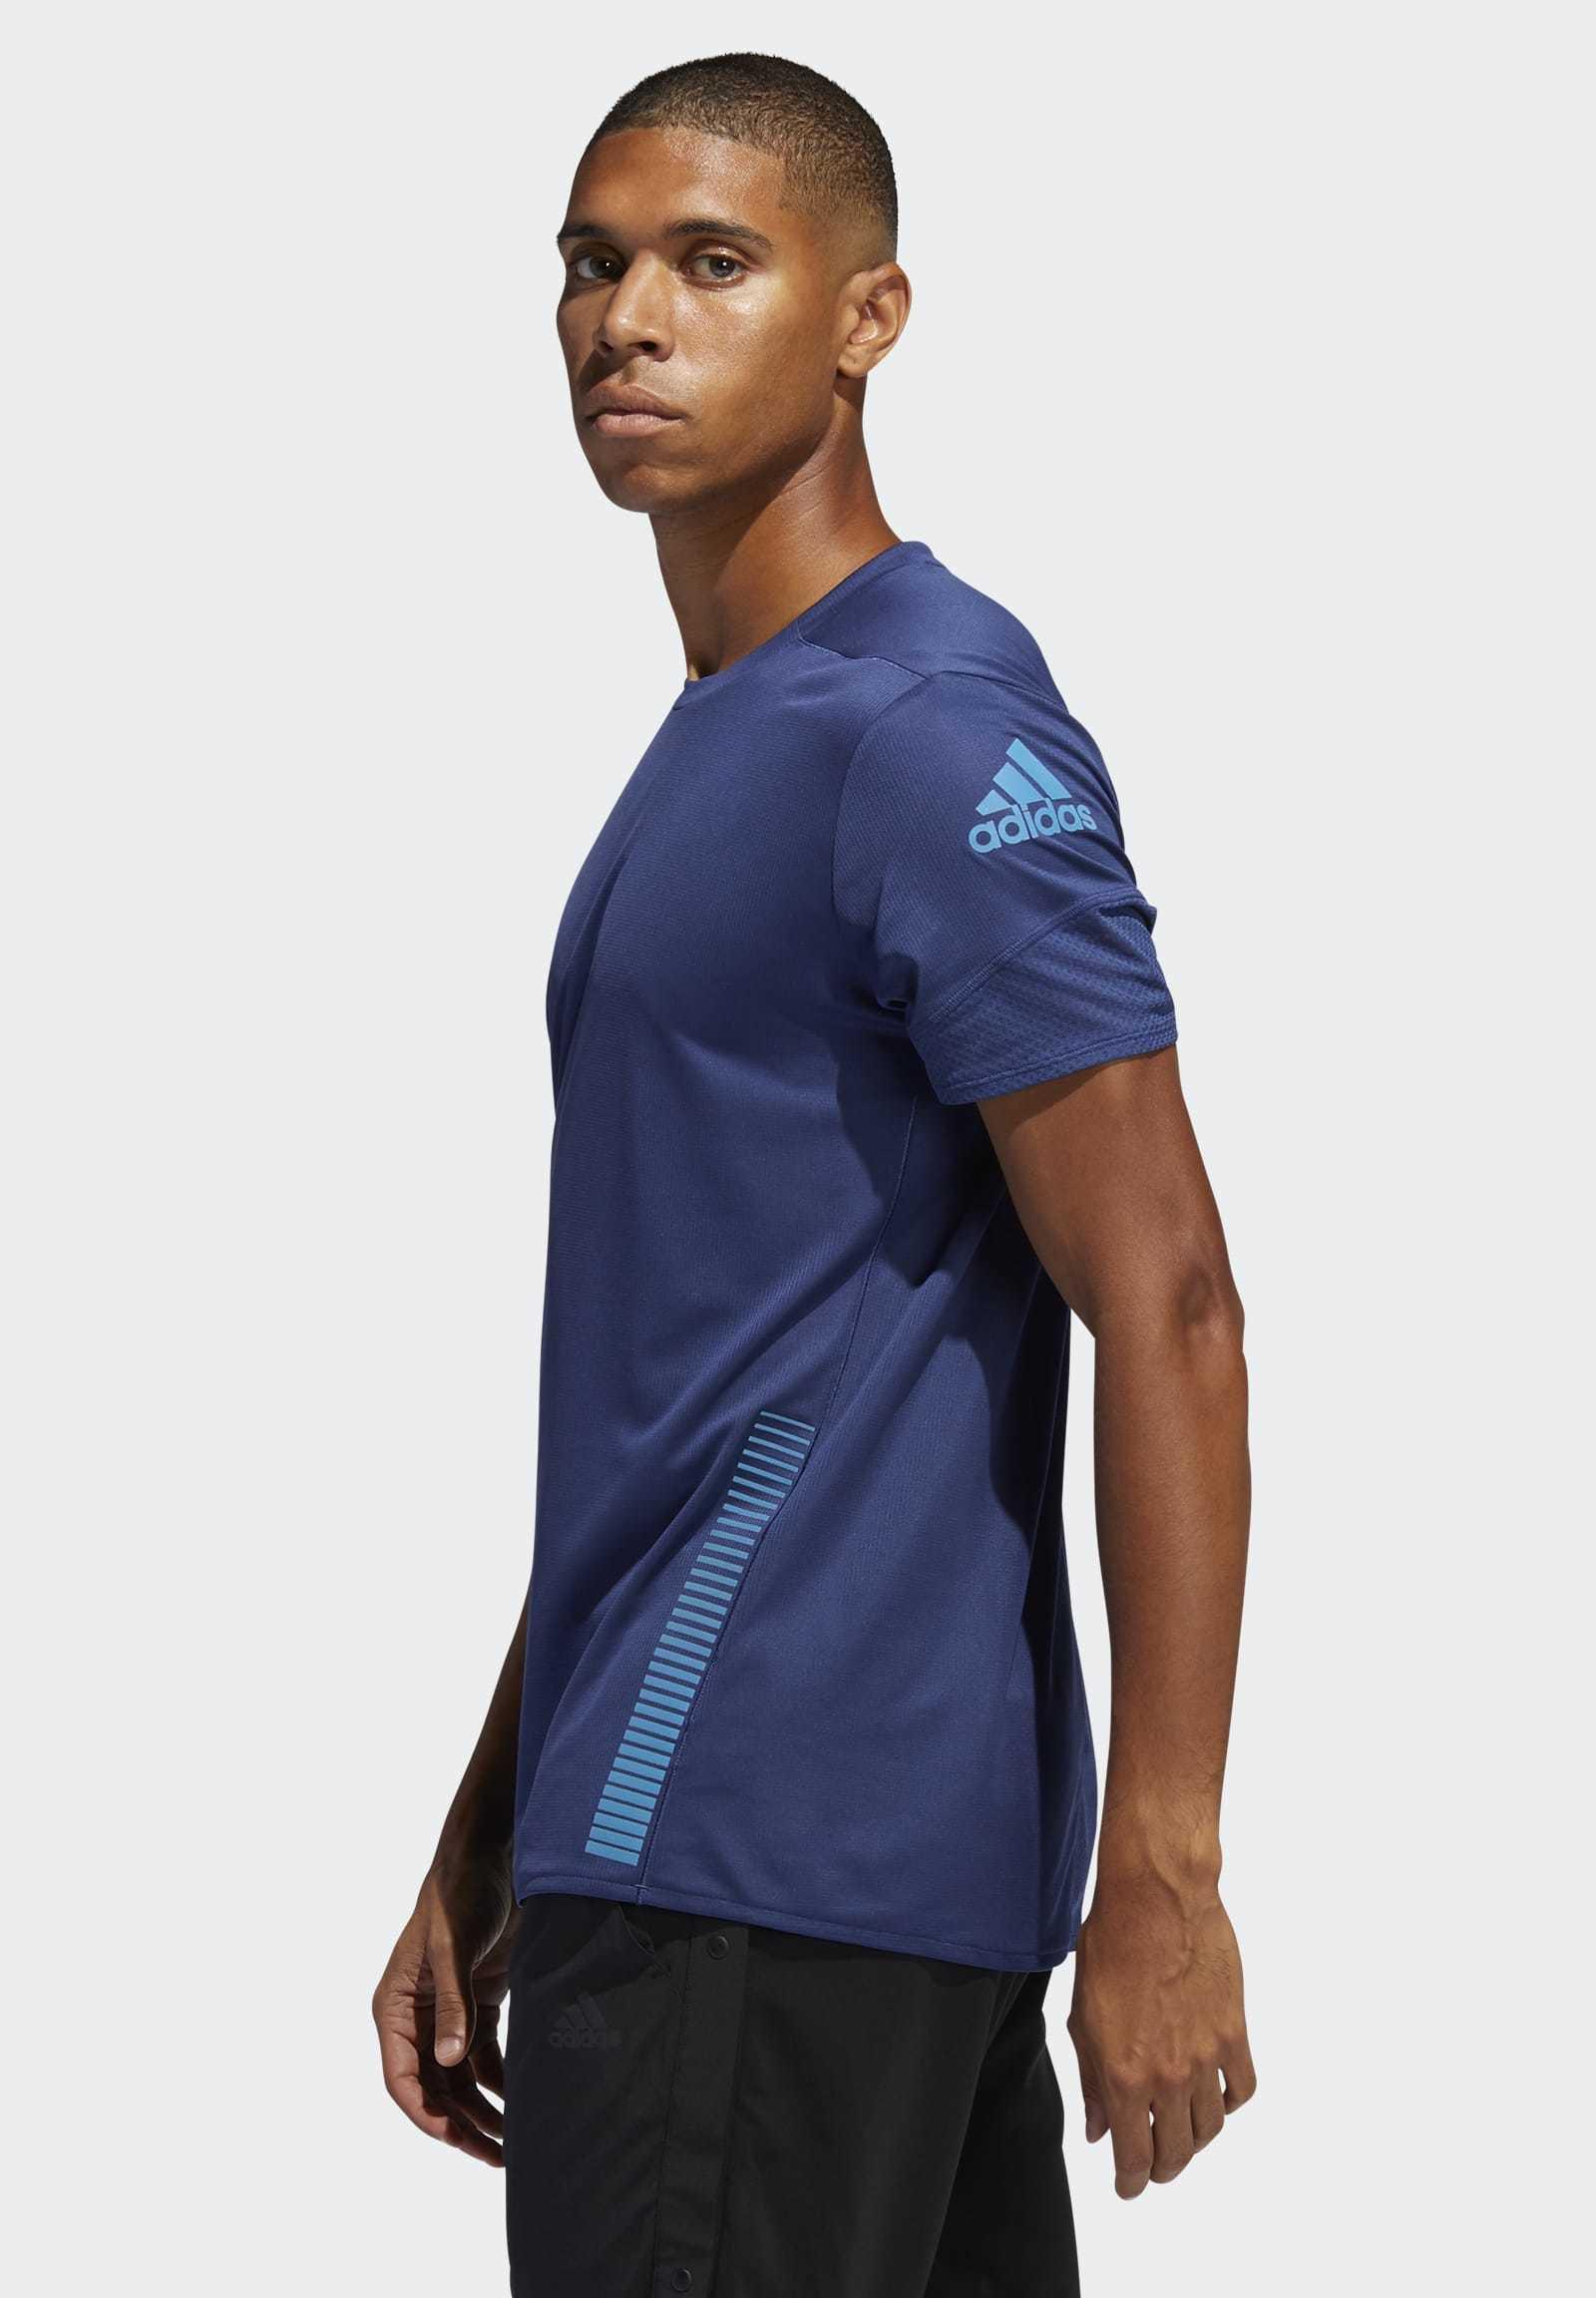 Adidas Performance Rise Up N Run Parley T-shirt - Print Tech Indigo YjoV00v